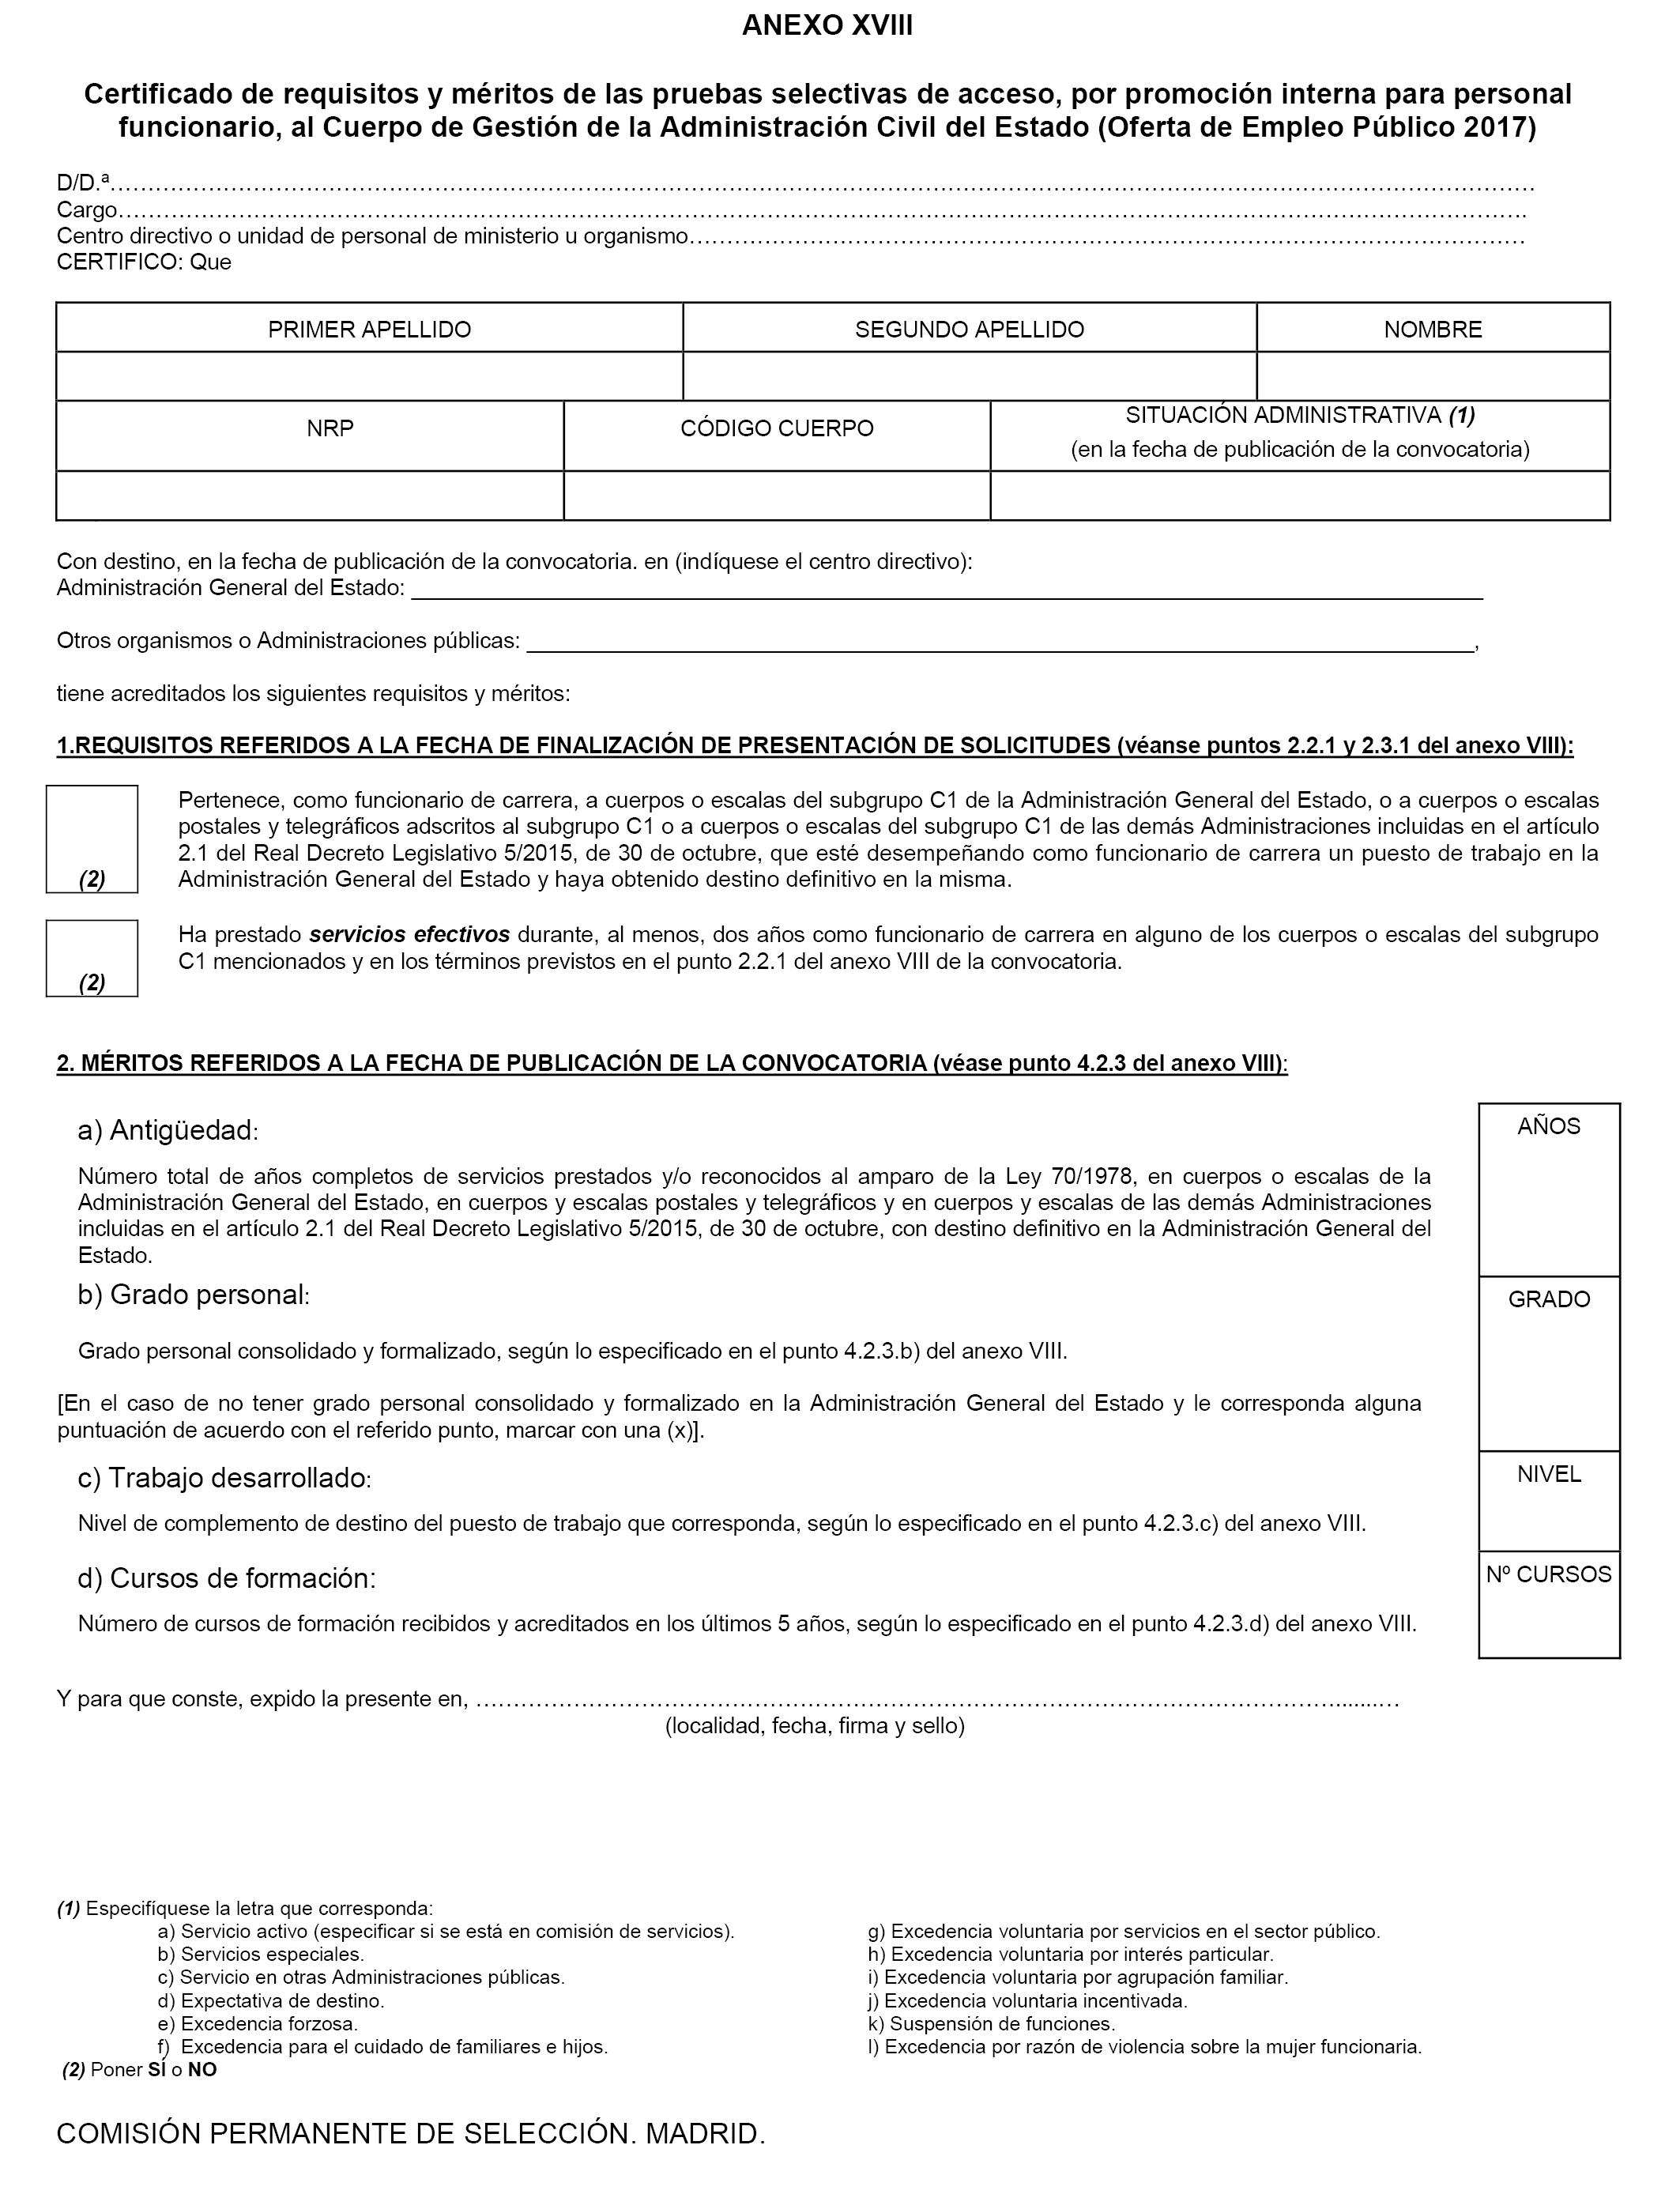 BOE.es - Documento BOE-A-2018-1169